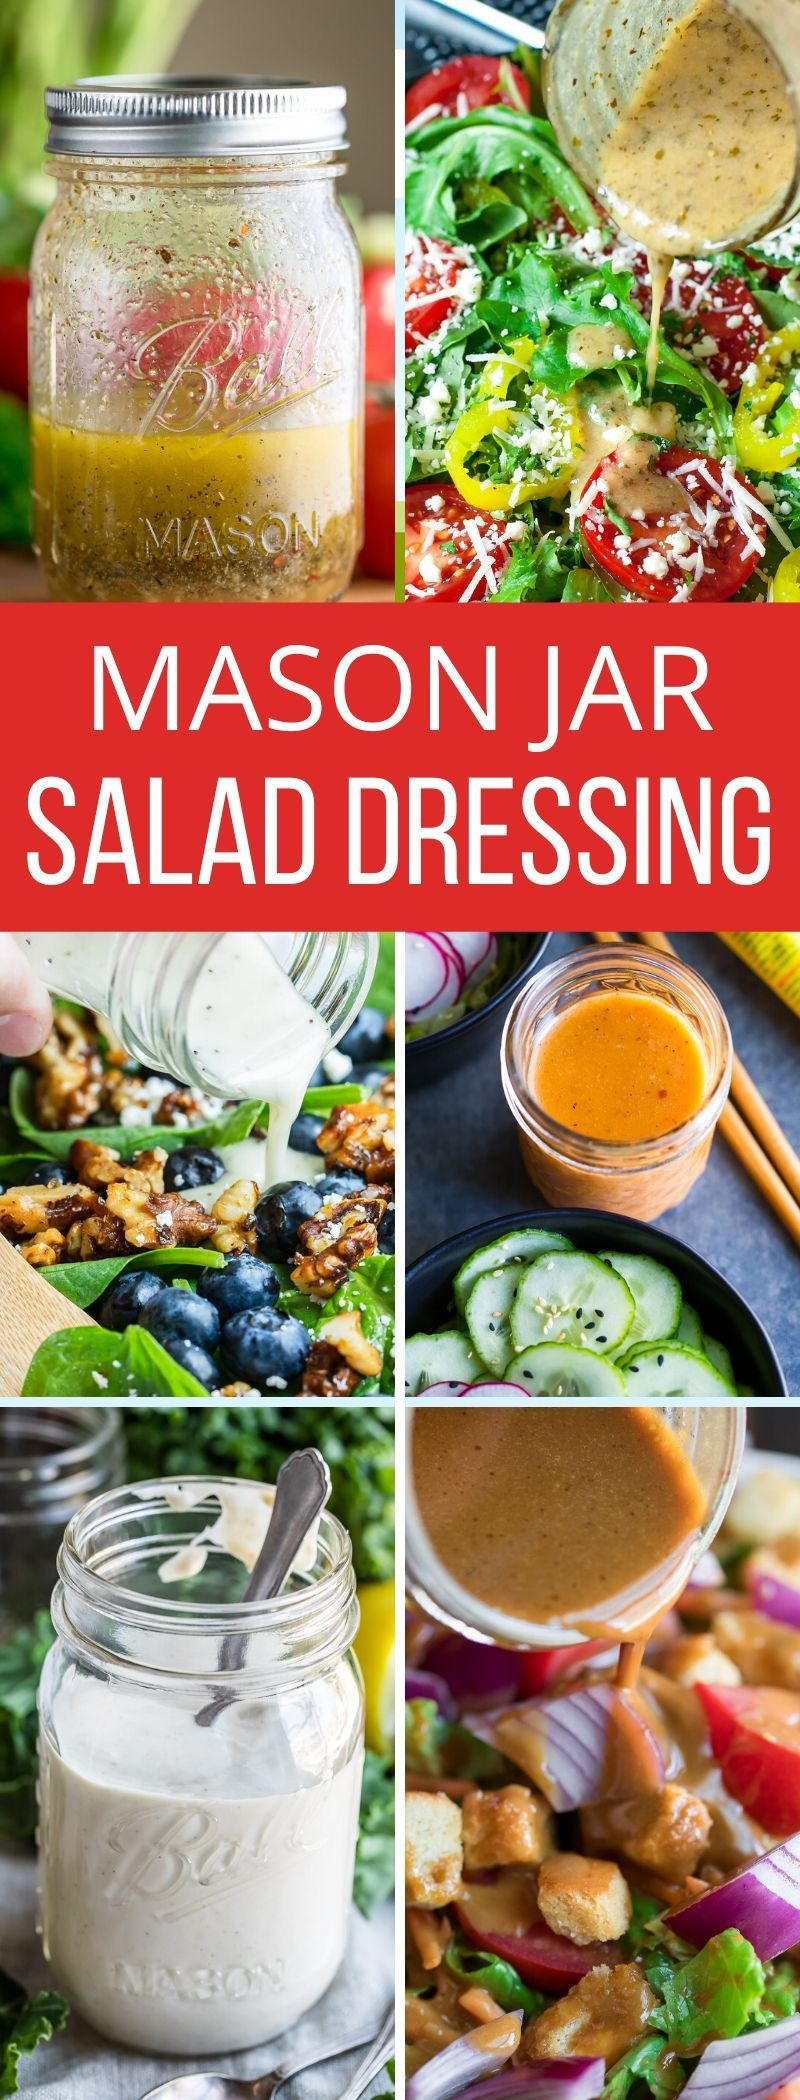 Mason Jar Salad Dressing Recipes Peas And Crayons In 2020 Mason Jar Salad Salad Dressing Recipes Salad In A Jar